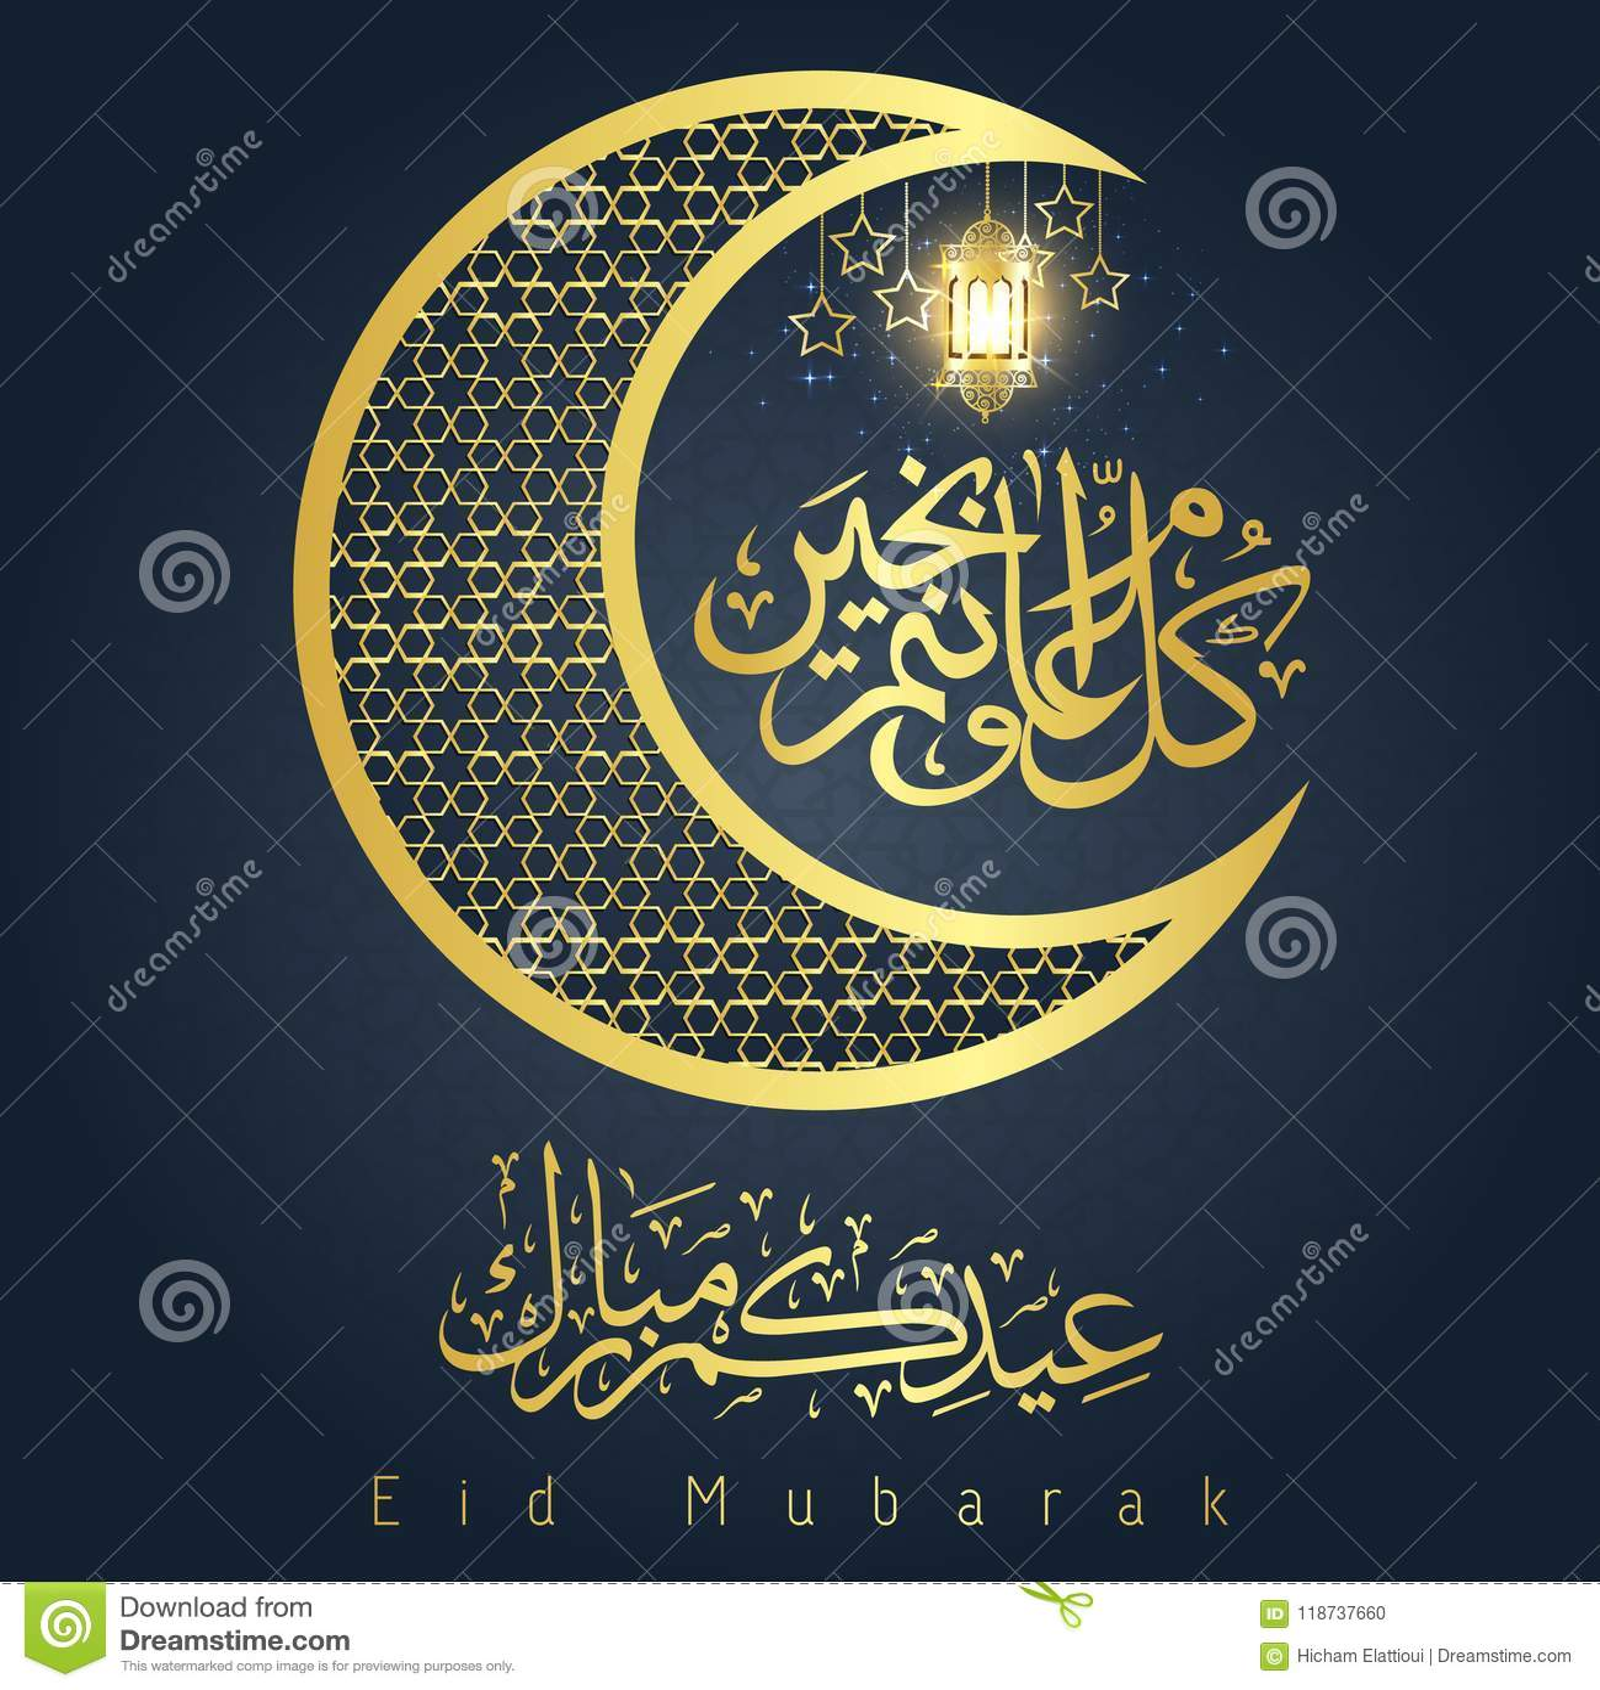 Islamic Vector Design Eid Mubarak Greeting Card Template With Arabic Pattern Stock Vector Illustration Of Geometric Design 118737660